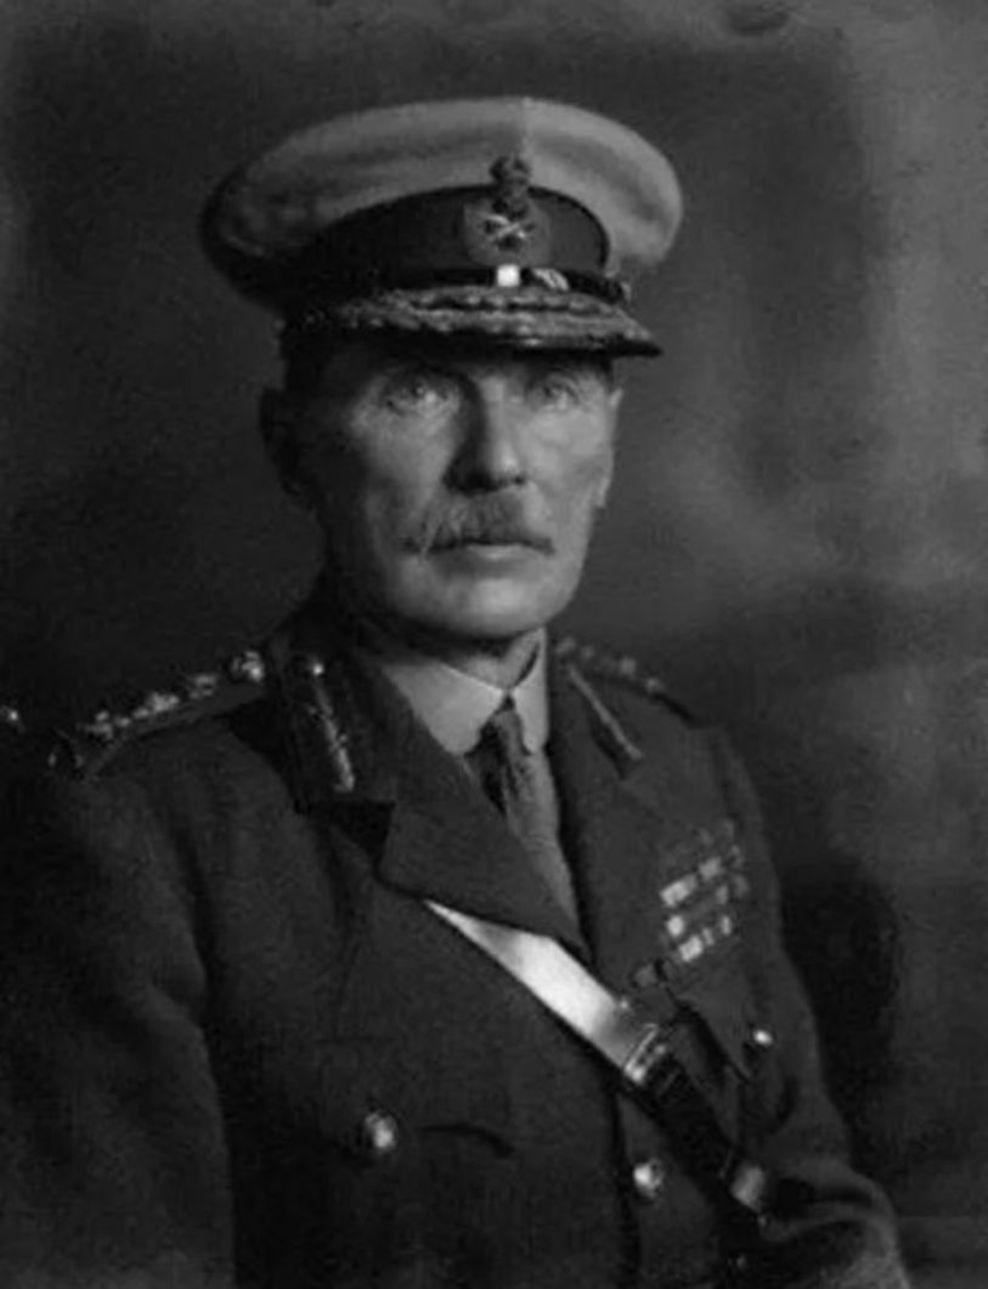 General Charles Harrington